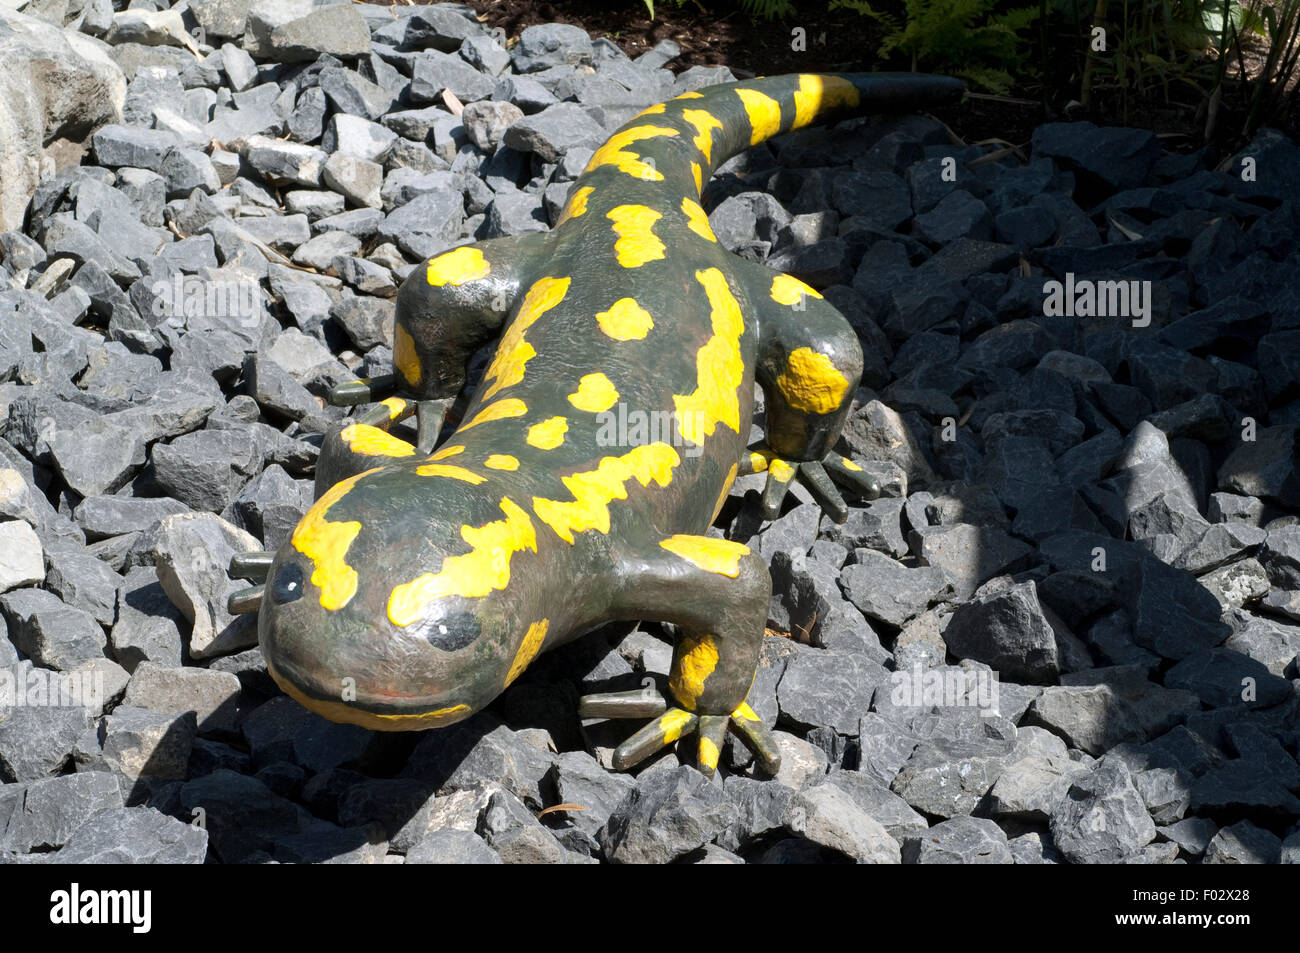 Feuersalamander, Salamander, Gartendekoration